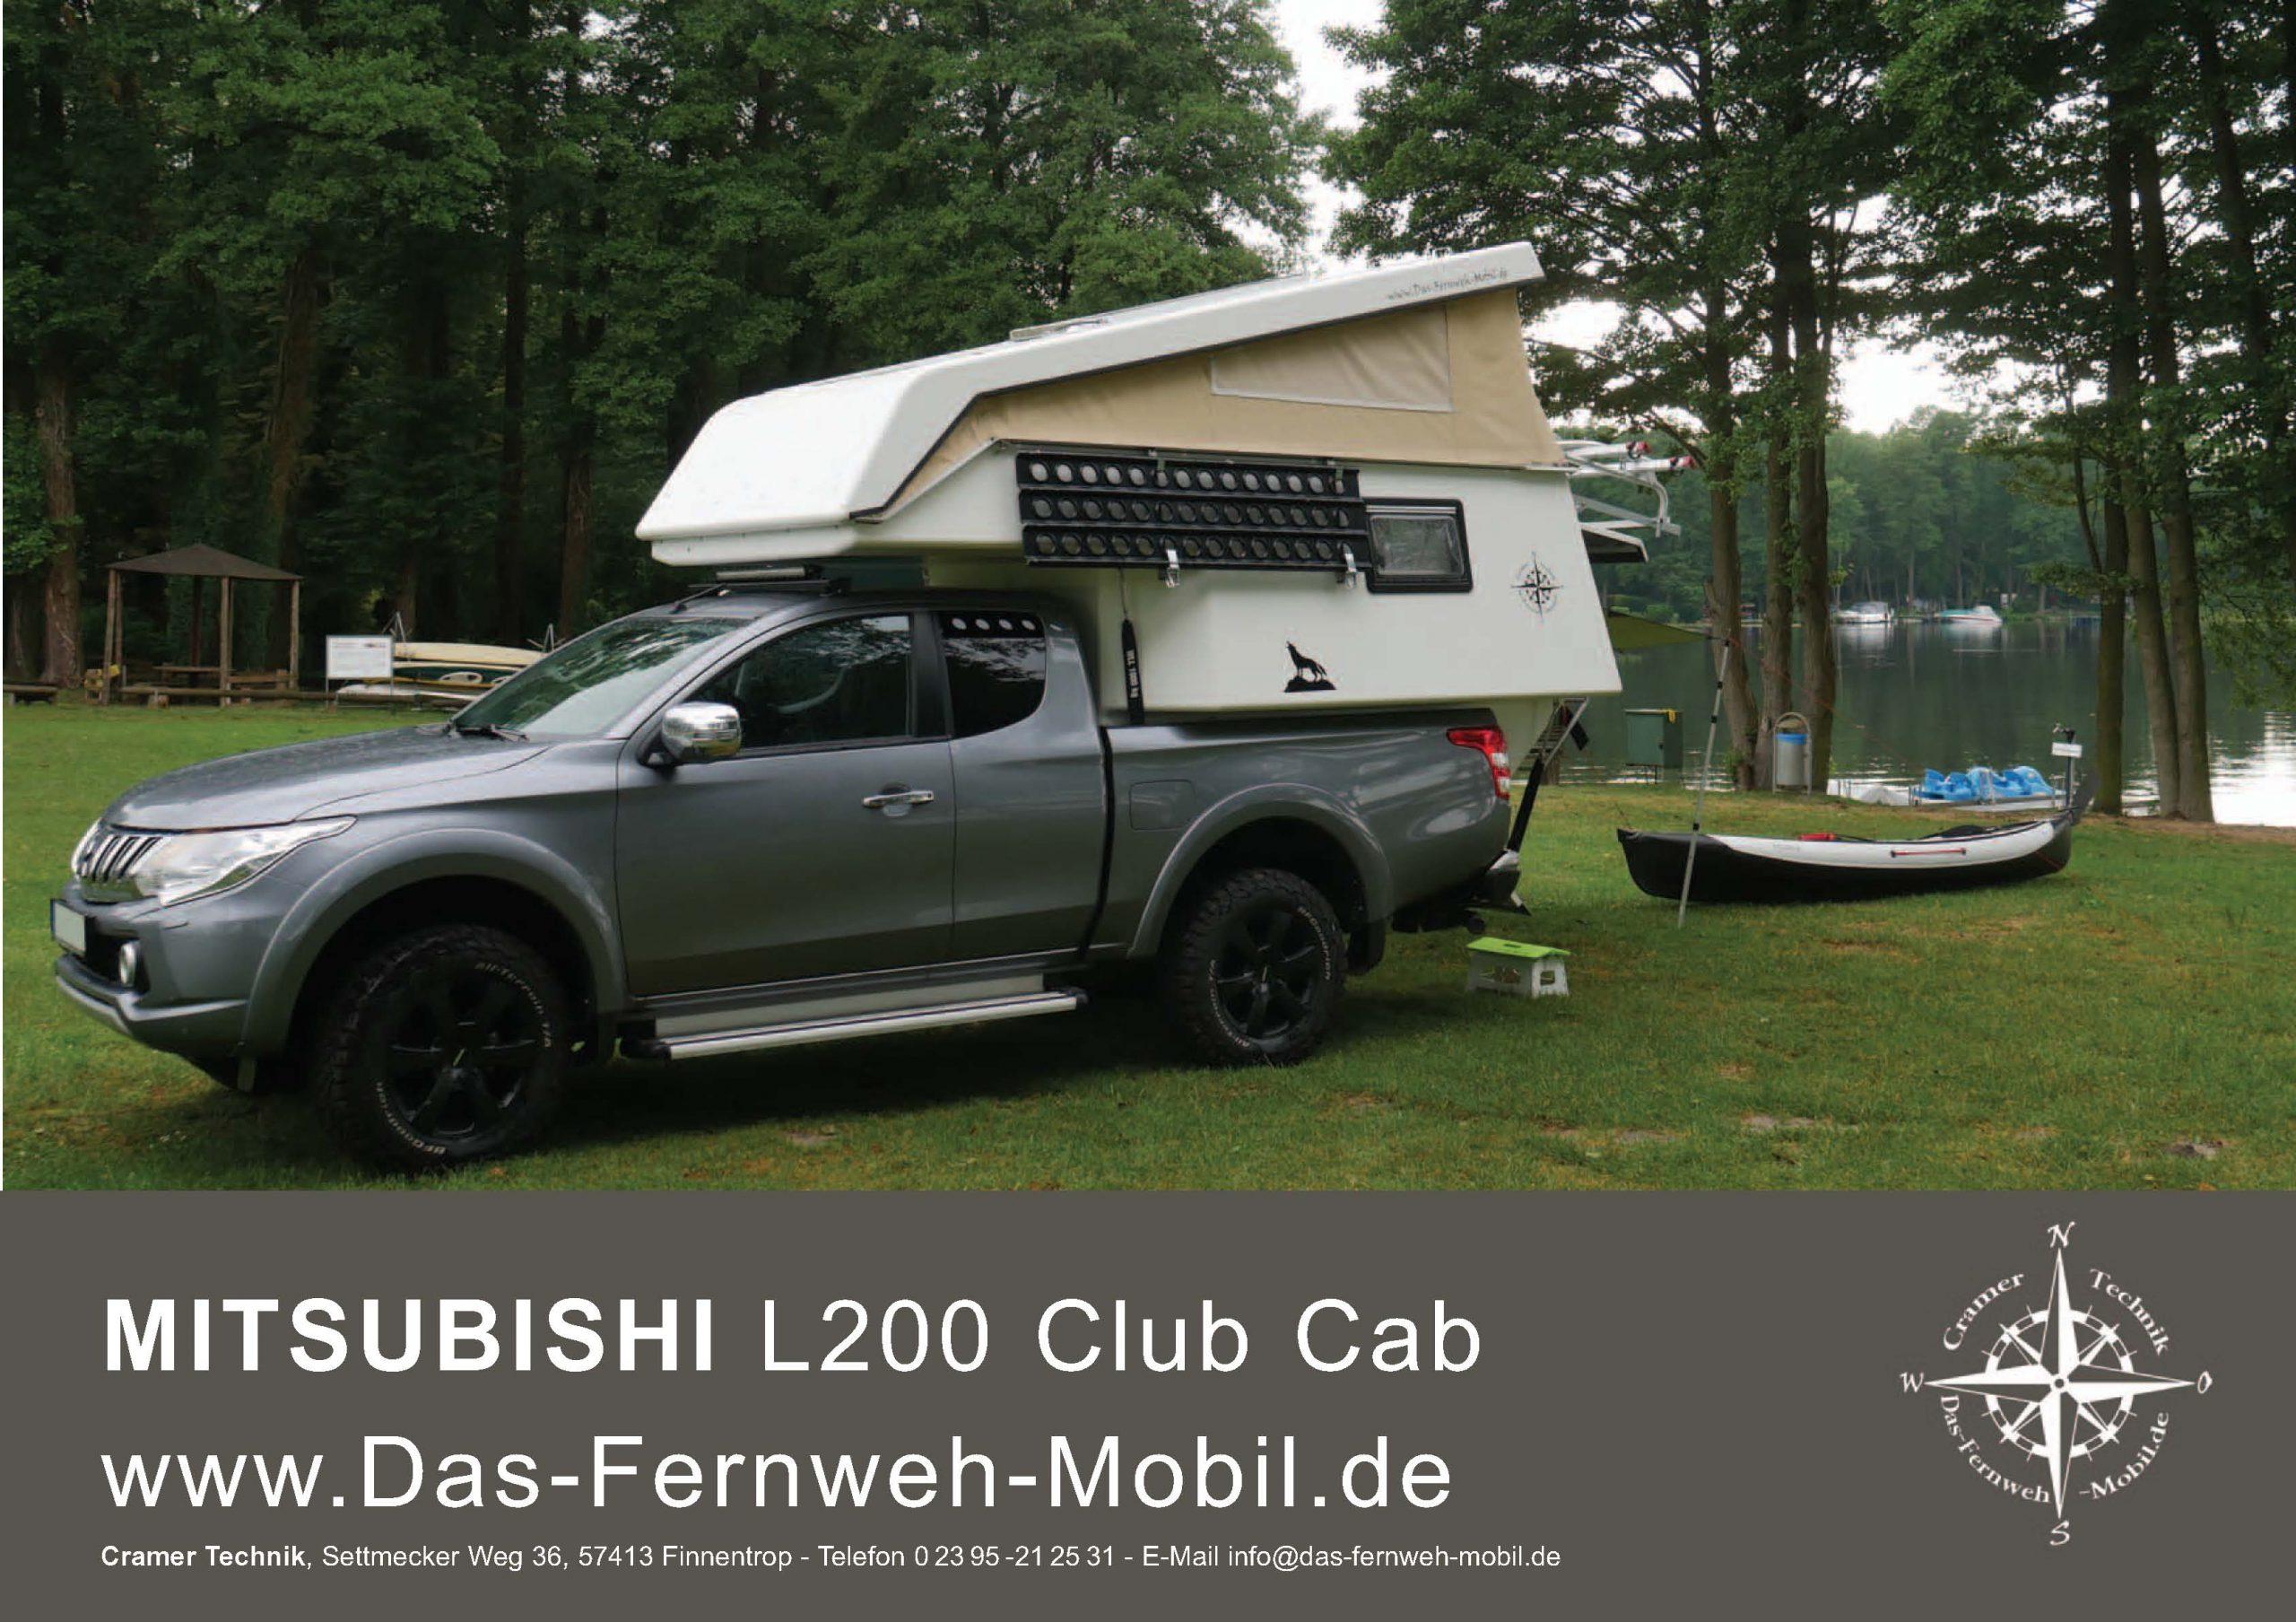 Datenblatt-Mitsubishi-Extra-Cab-102019-k_Seite_1